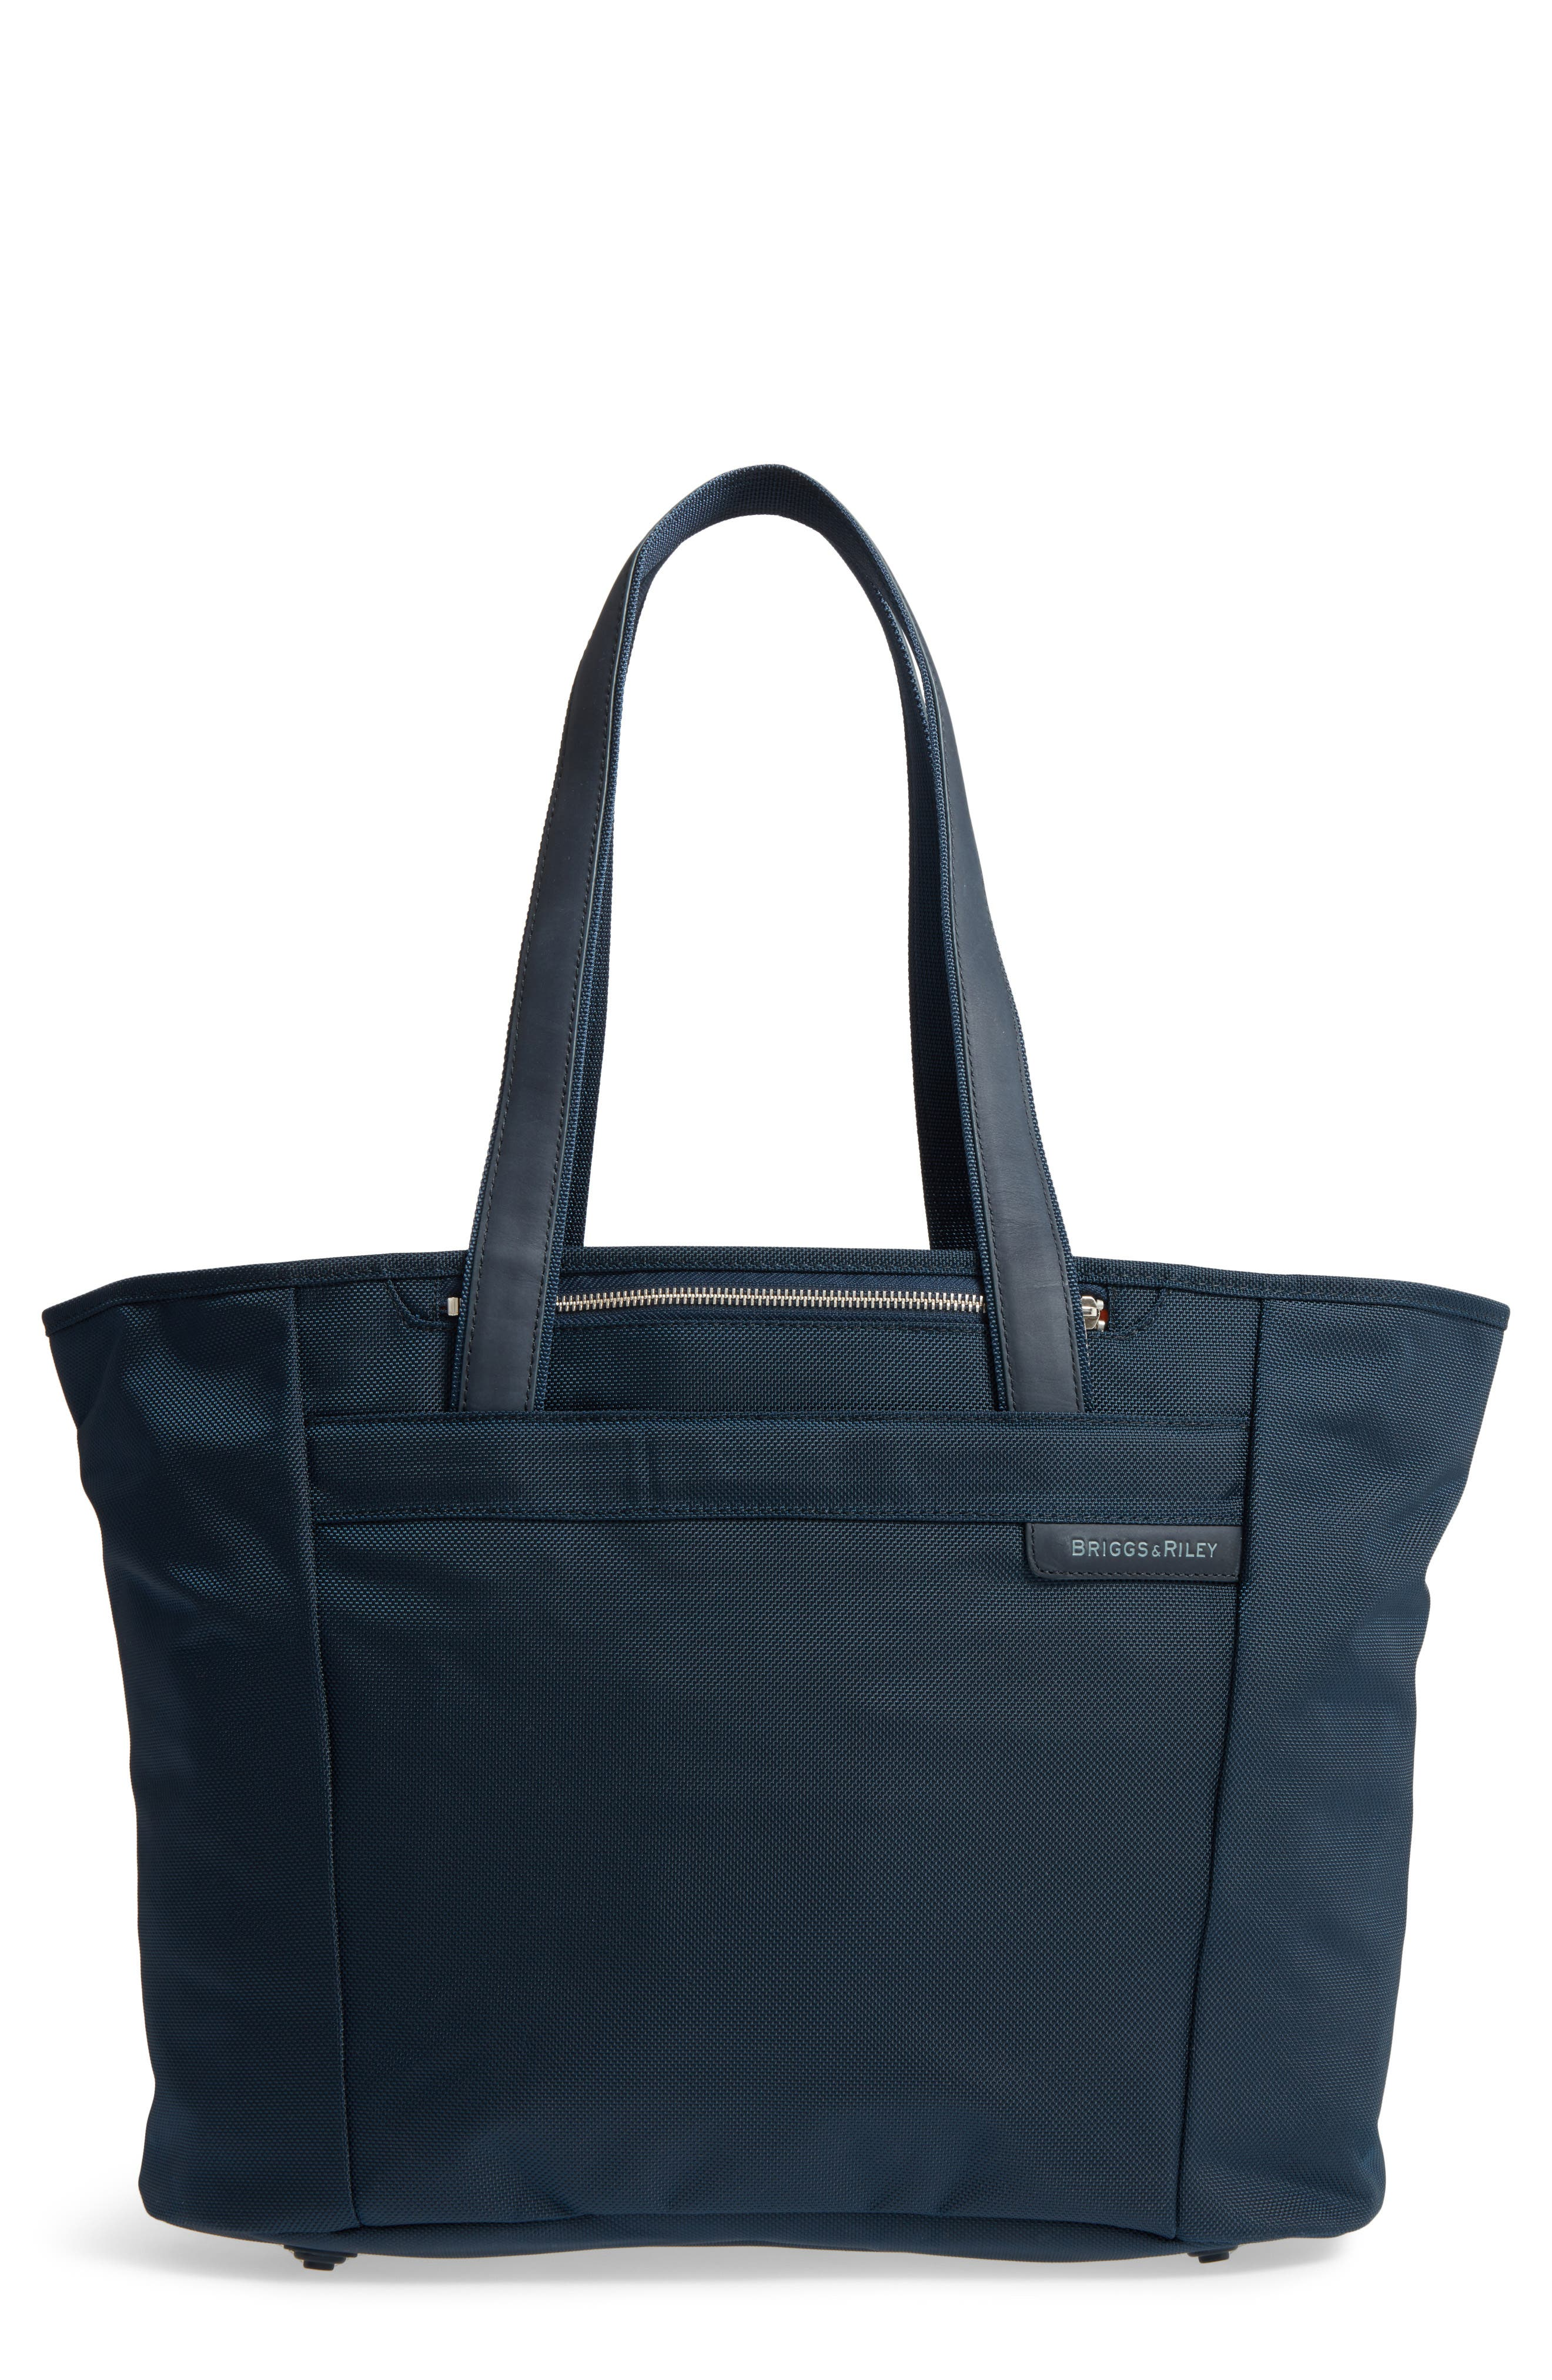 Main Image - Briggs & Riley Ltd. Edition Tote Bag